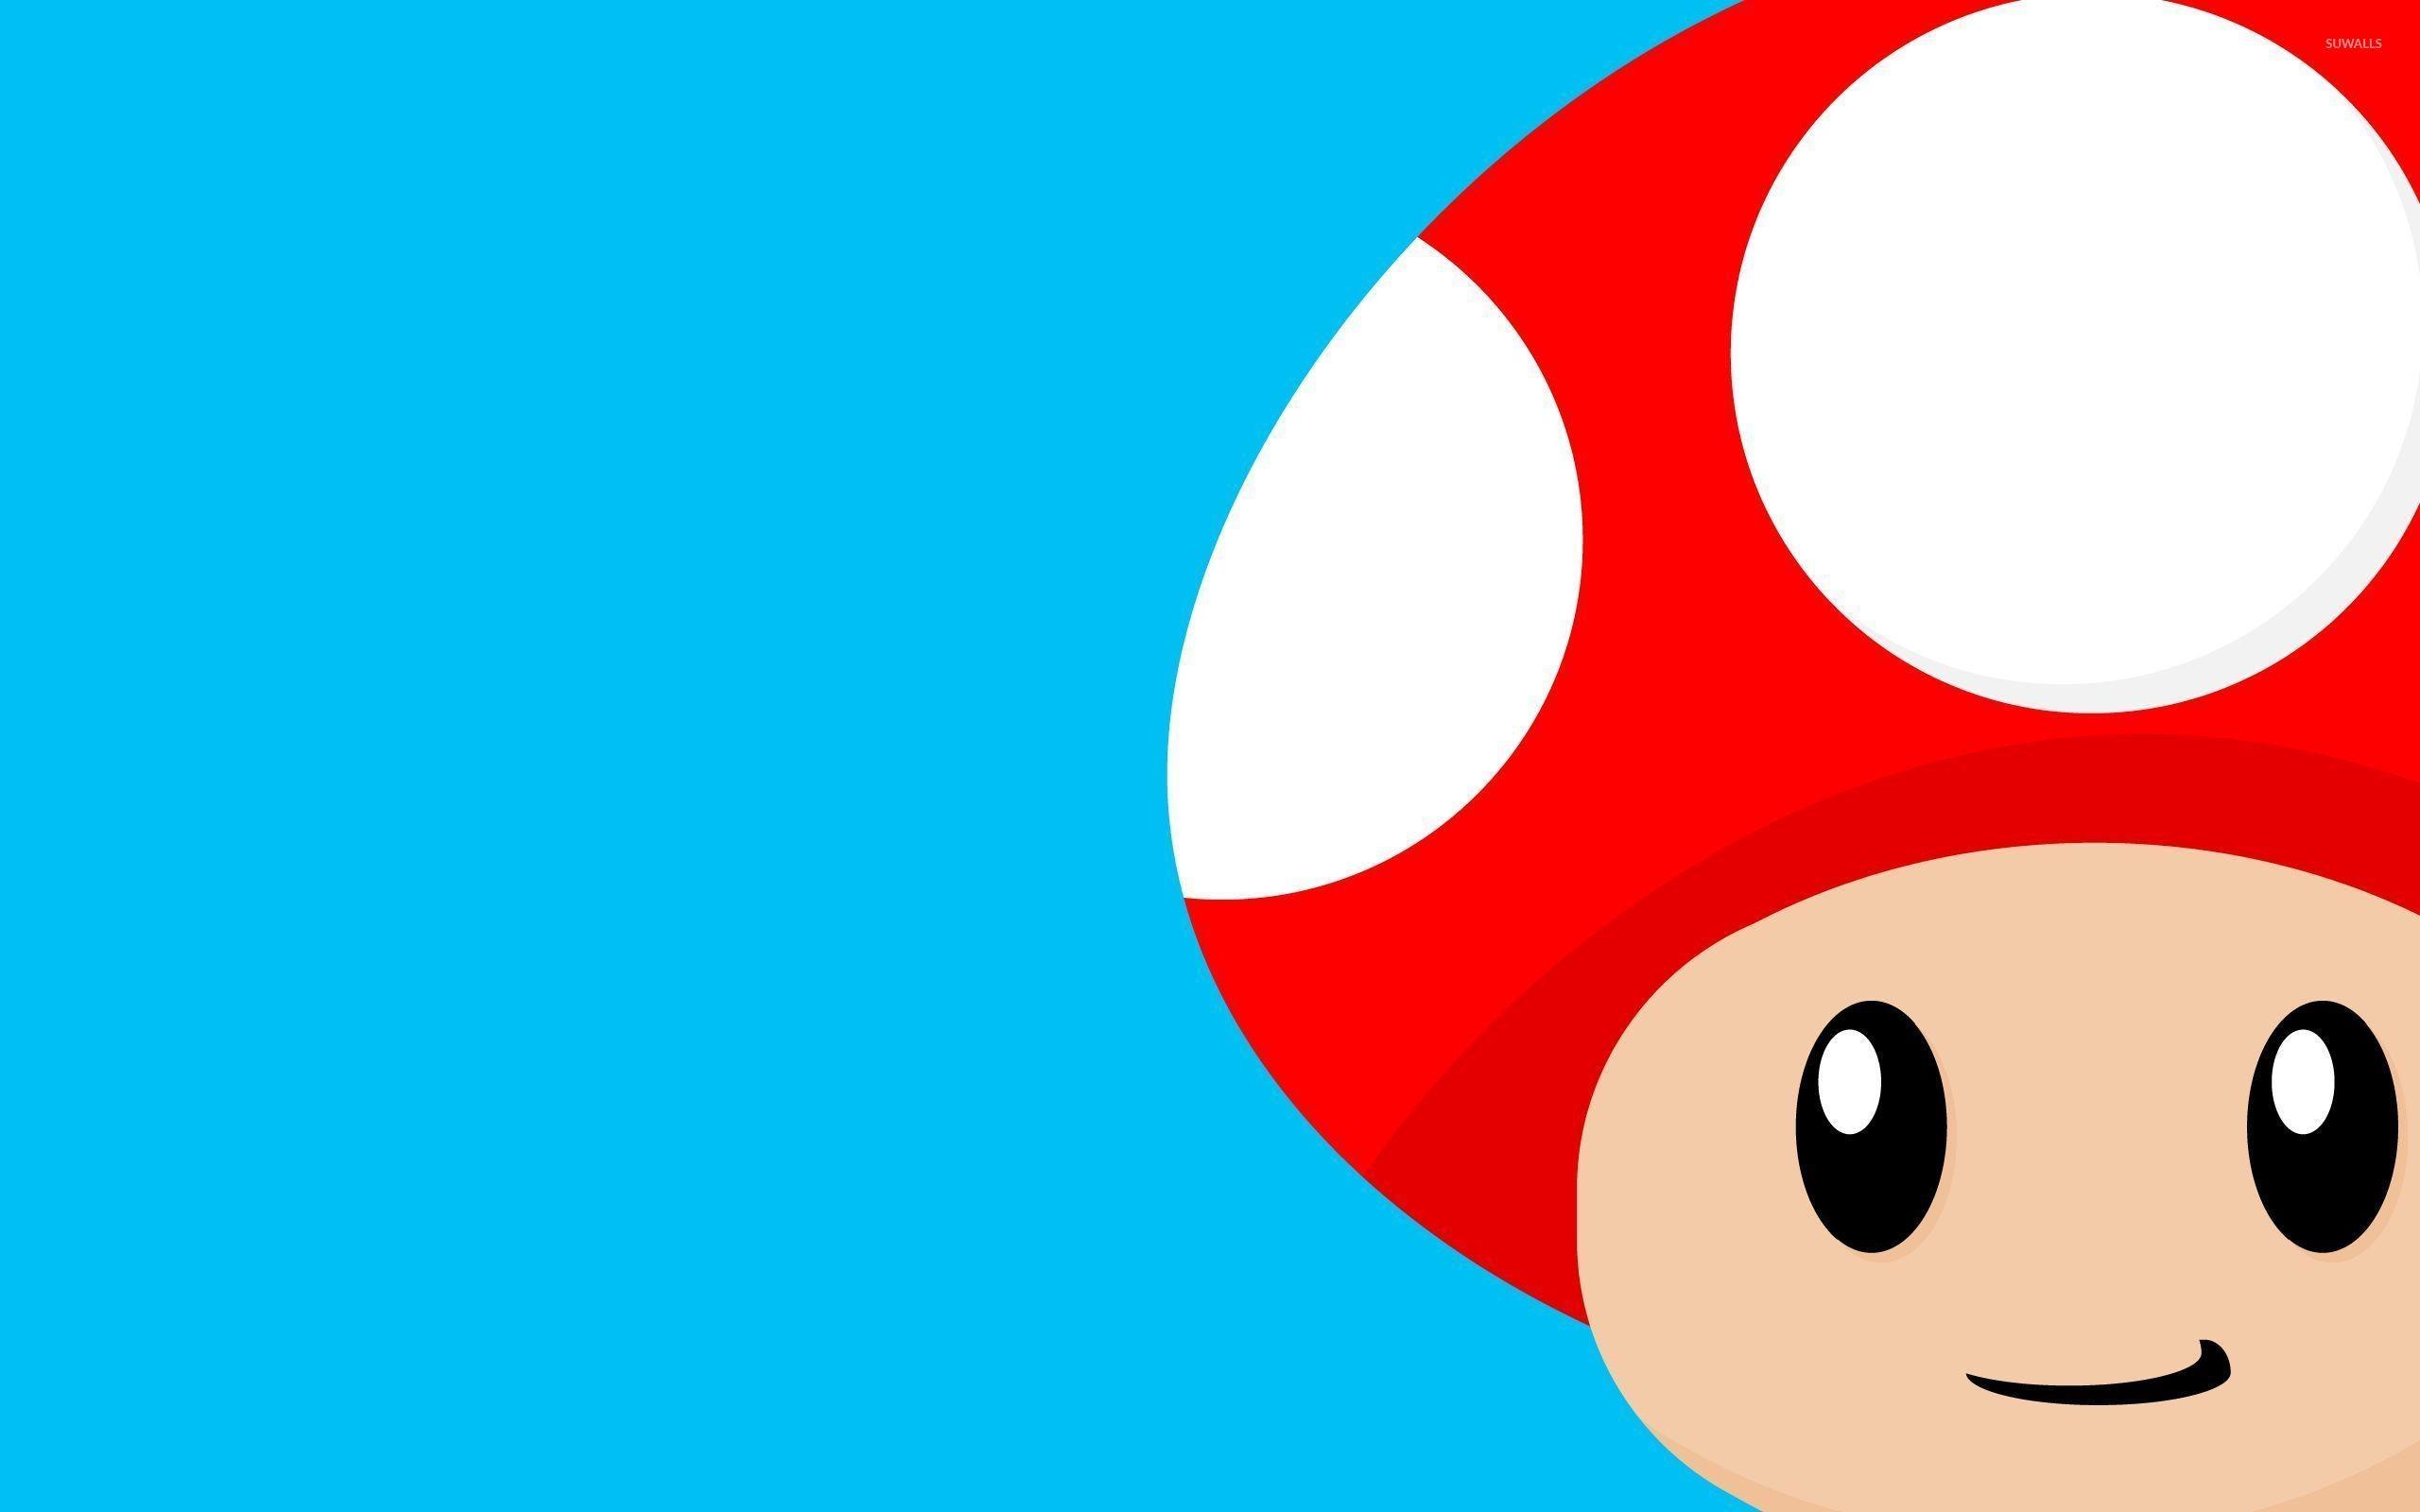 Res: 2560x1600, Mario mushroom wallpaper Vector wallpapers 26595